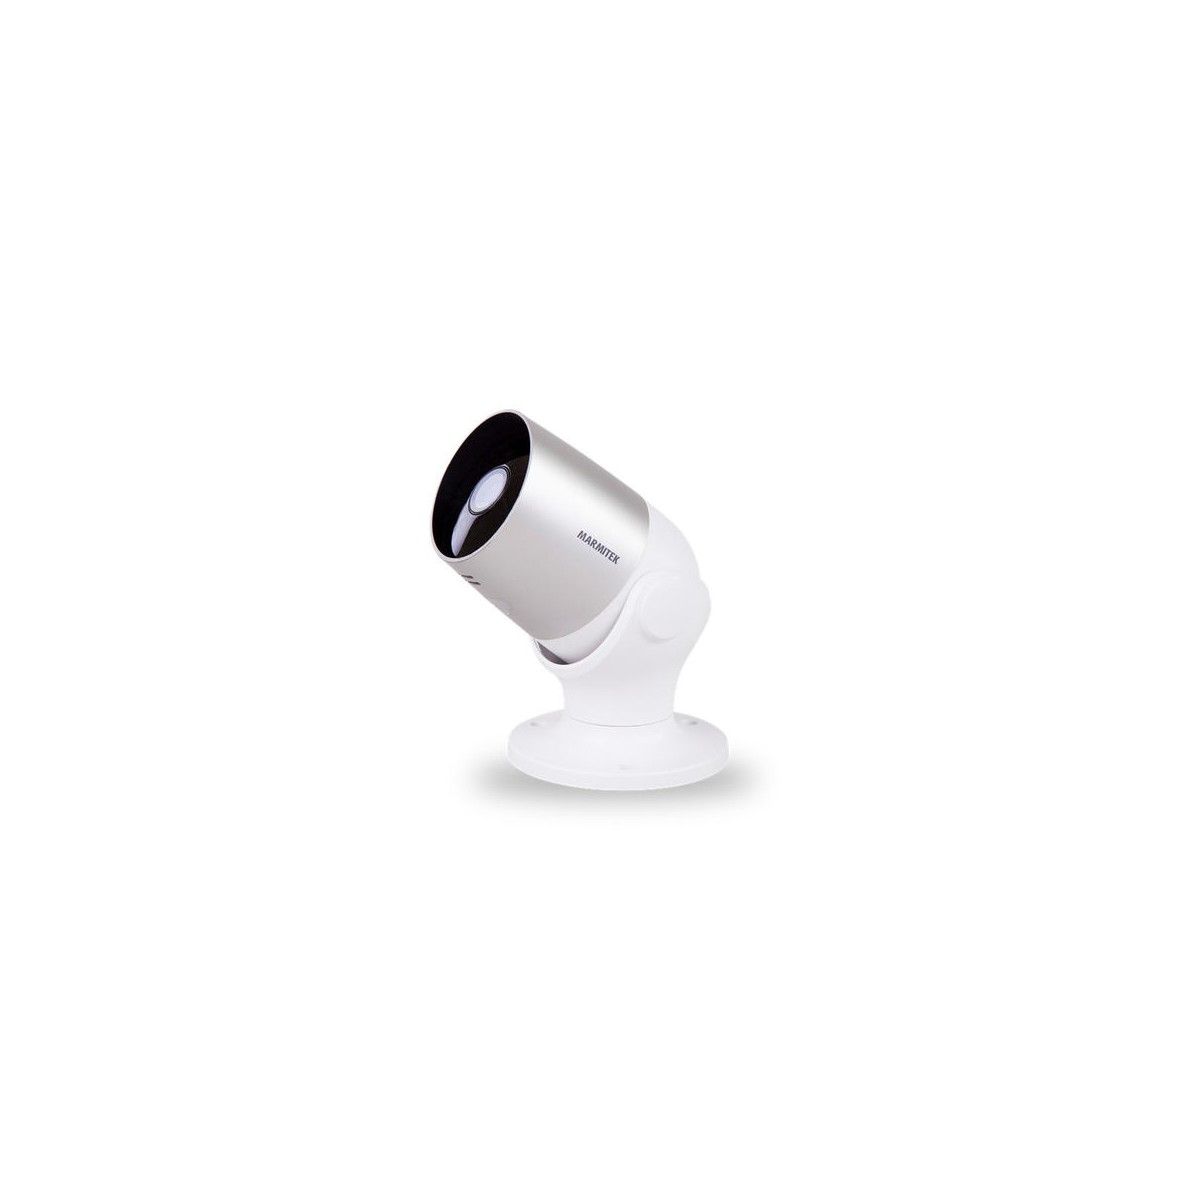 Okos Wi-Fi Kamera VIEW MO